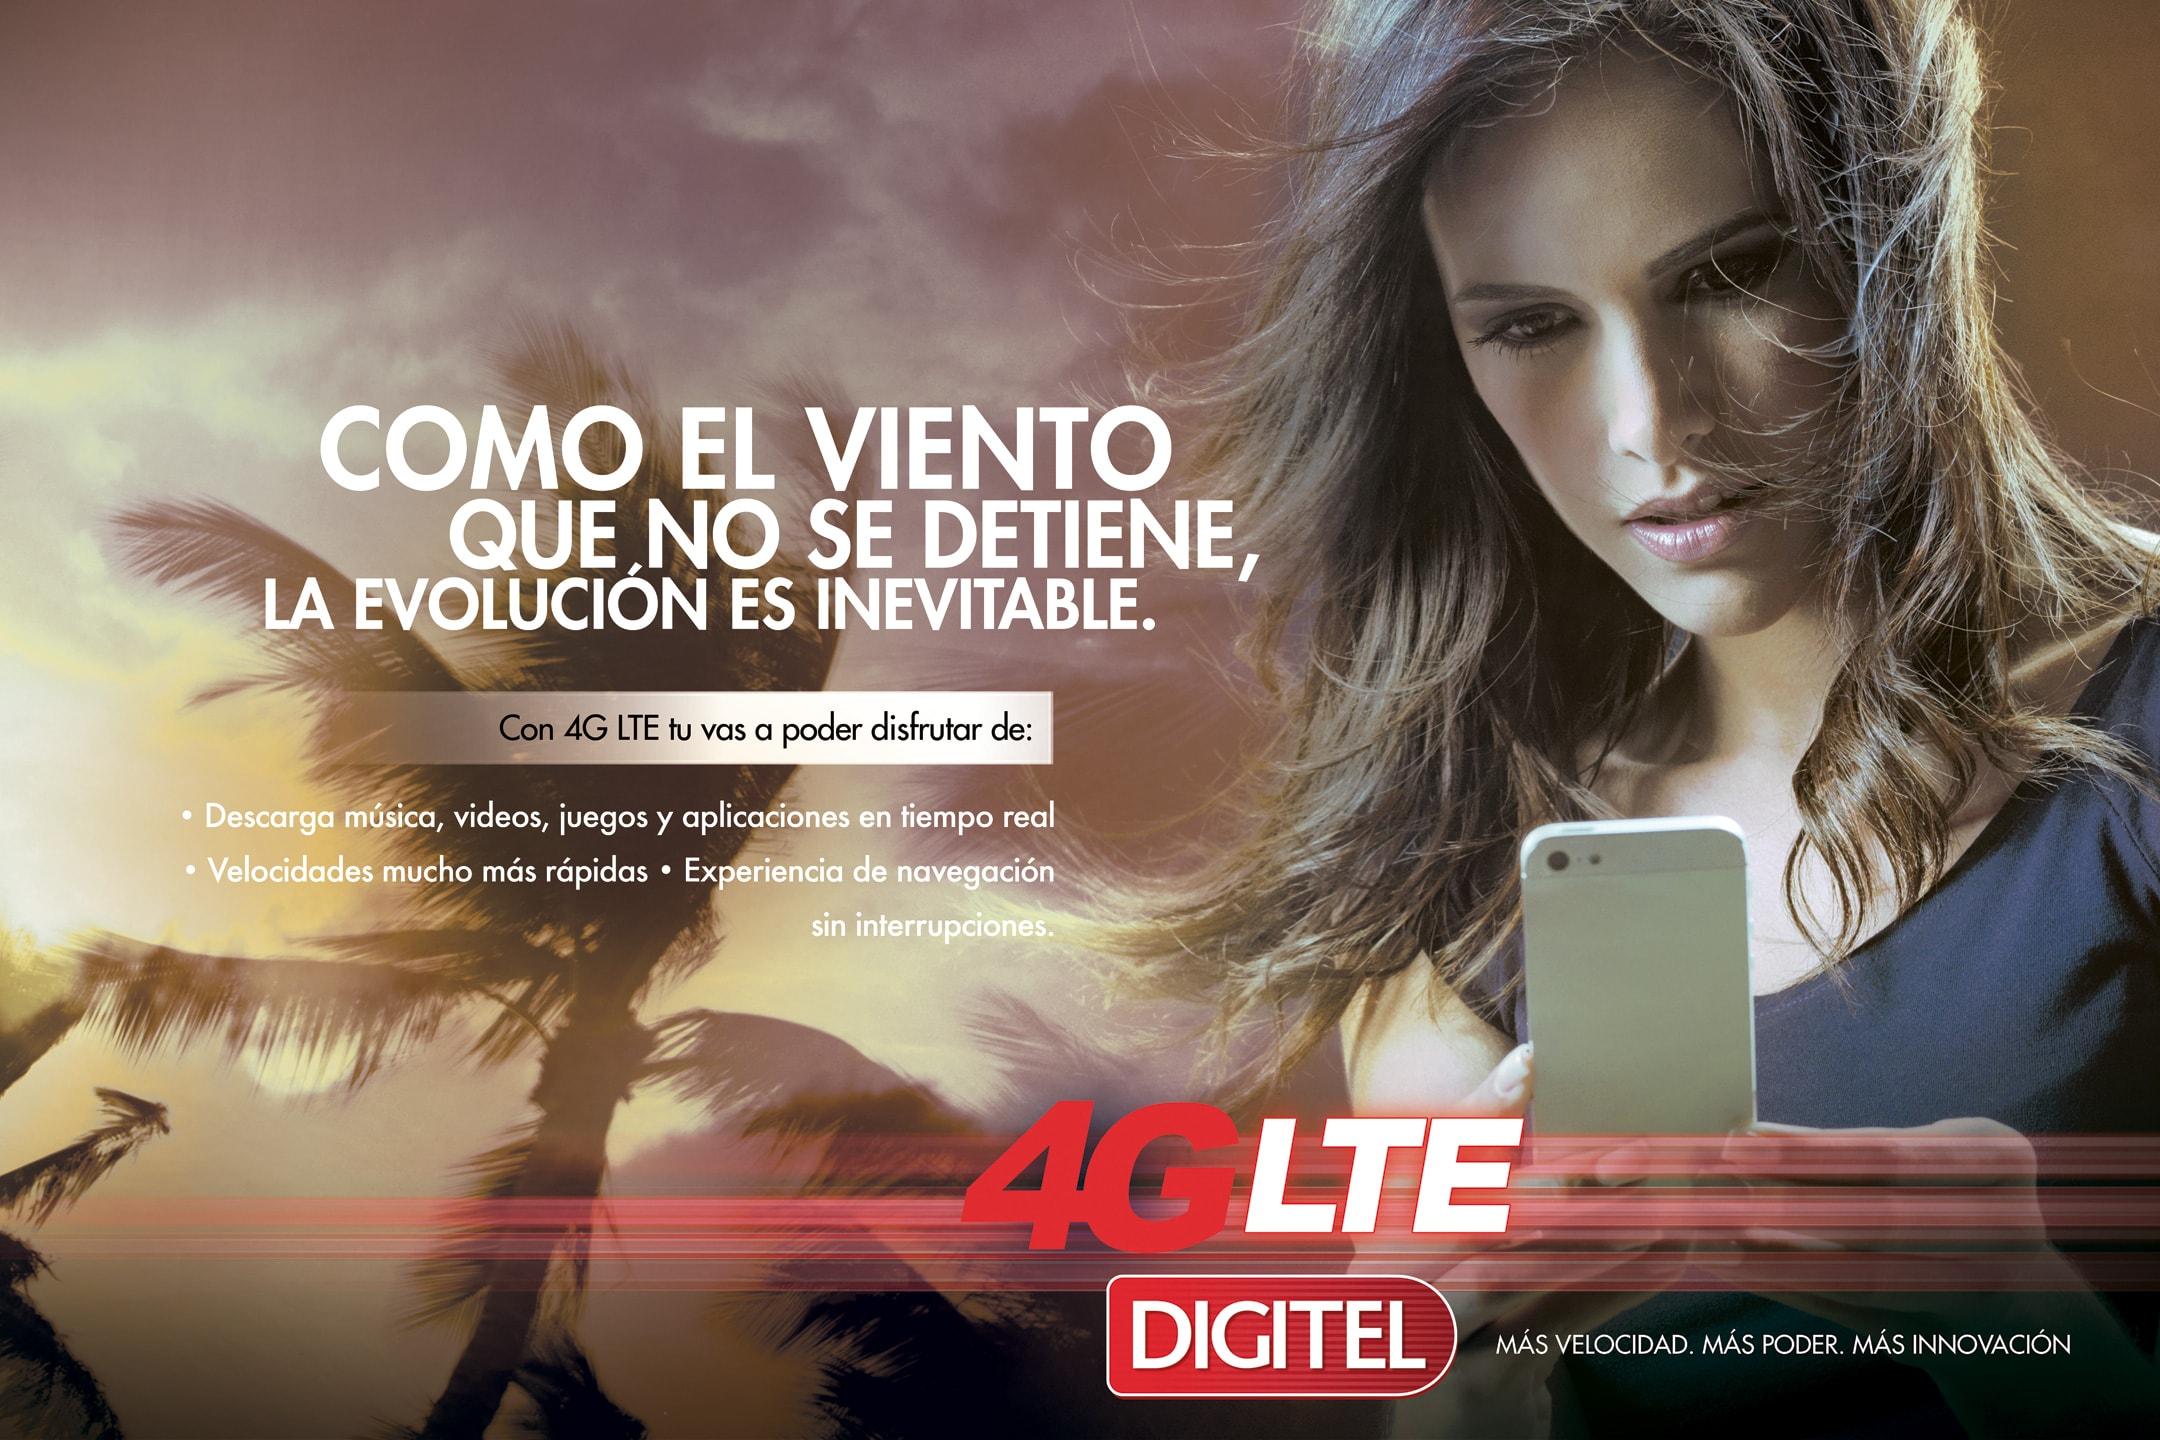 digitel-advertising-photography-miami-marcel-boldu.jpg